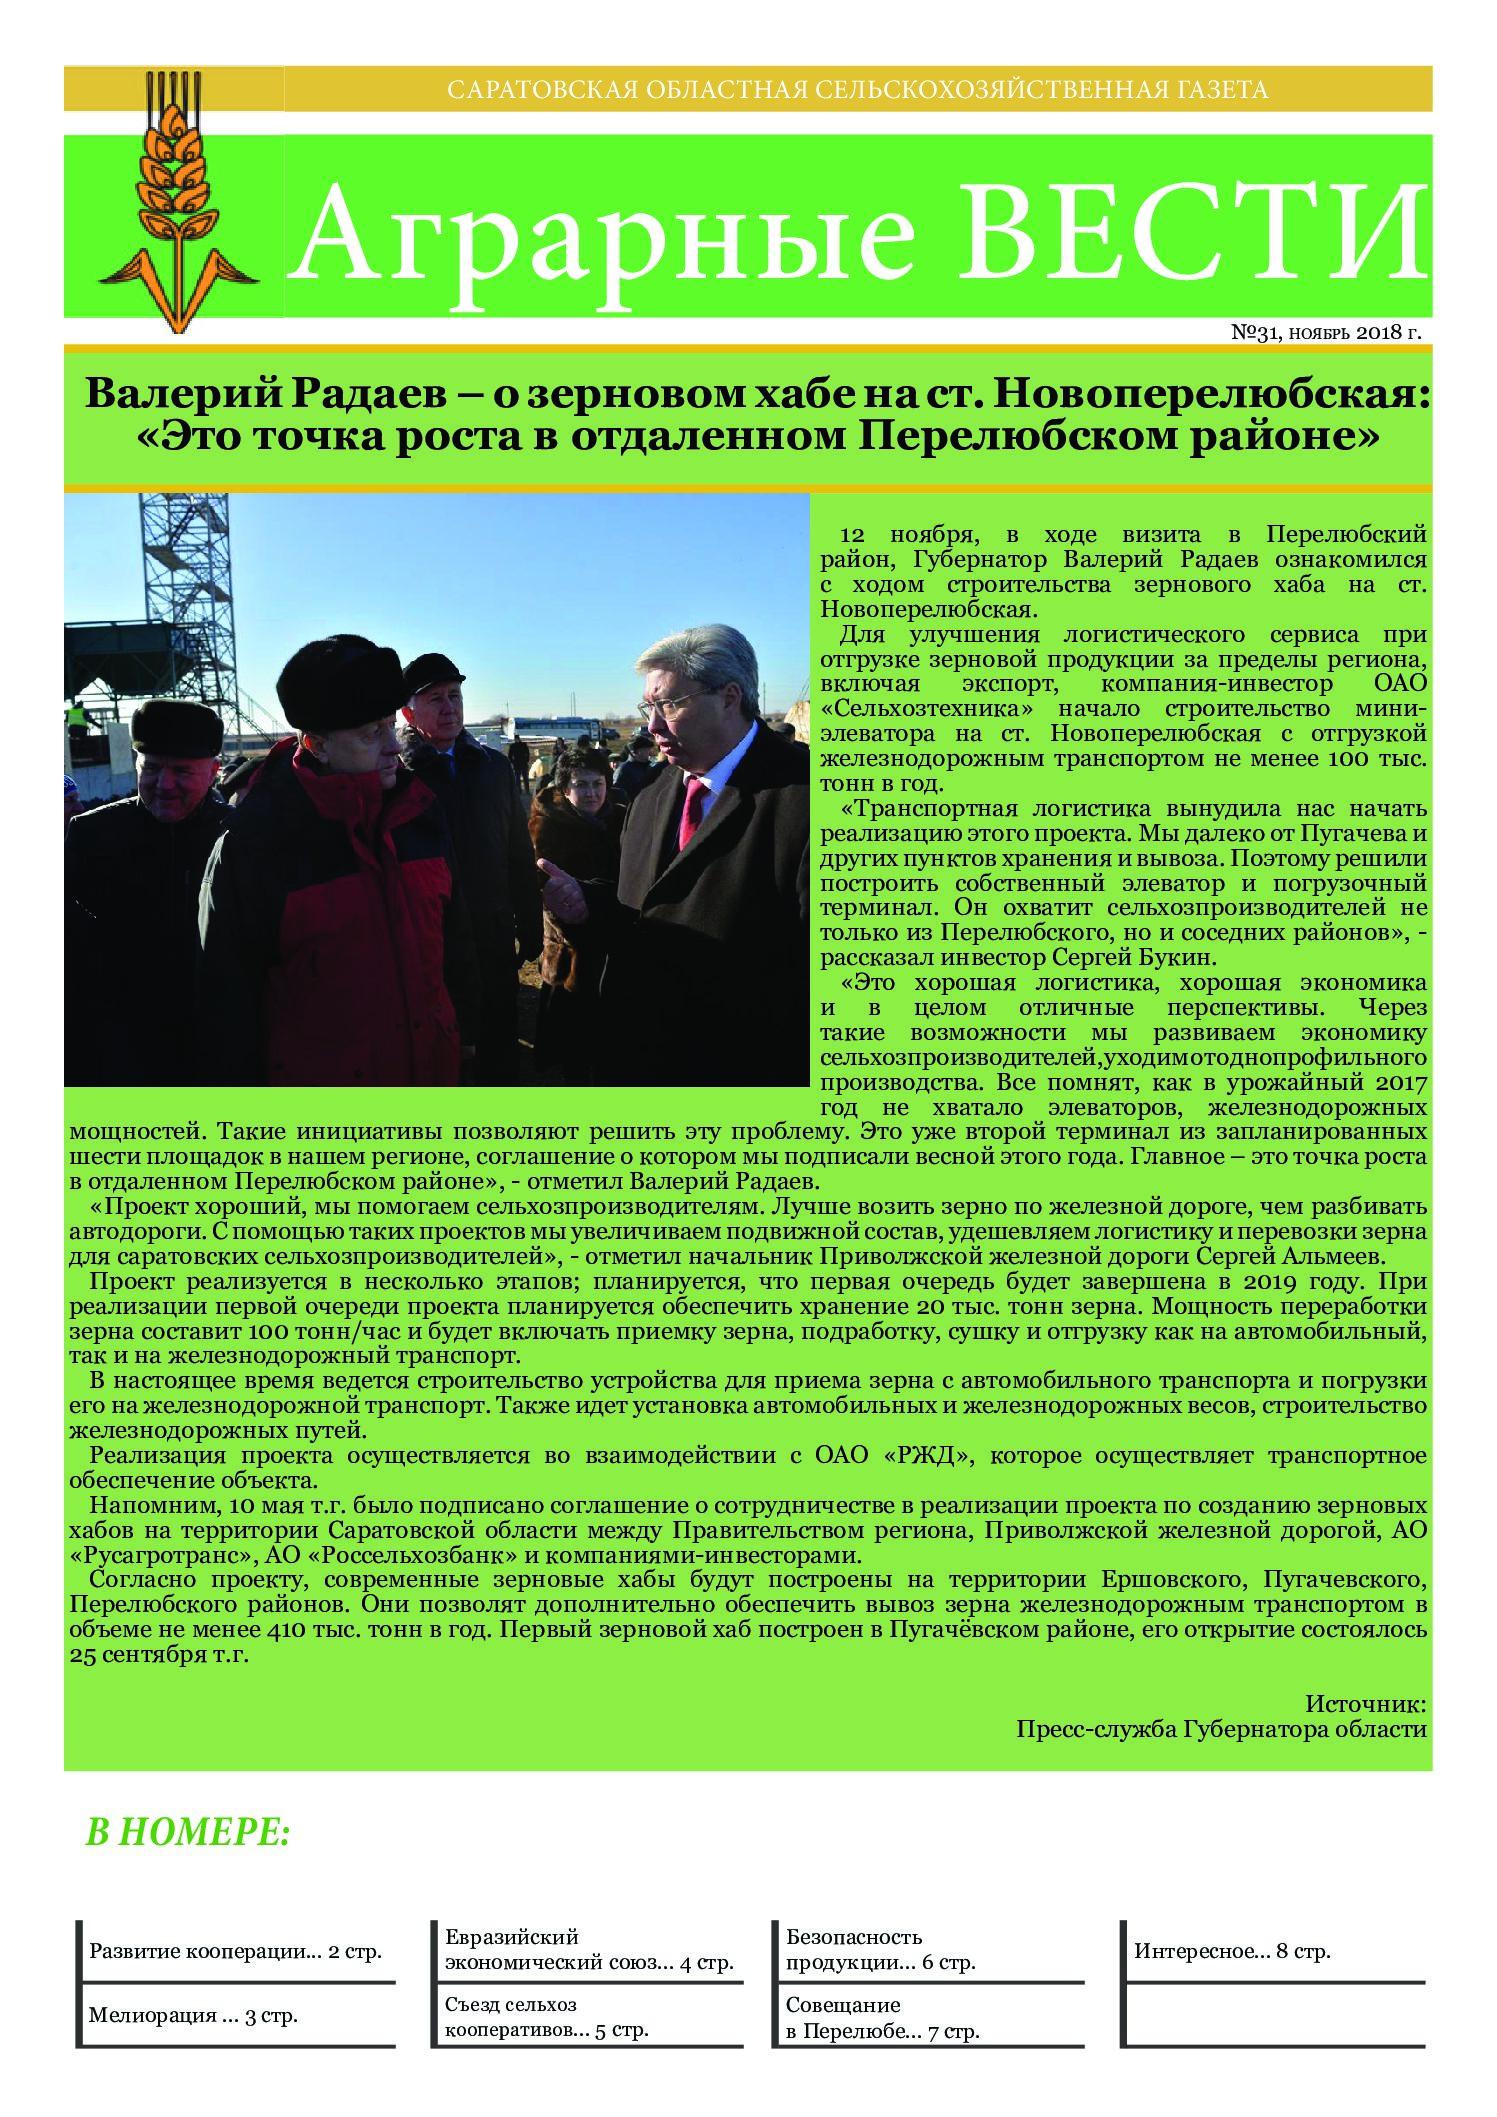 https://saratovagro.ru/wp-content/uploads/2020/08/10.2018-pdf.jpg